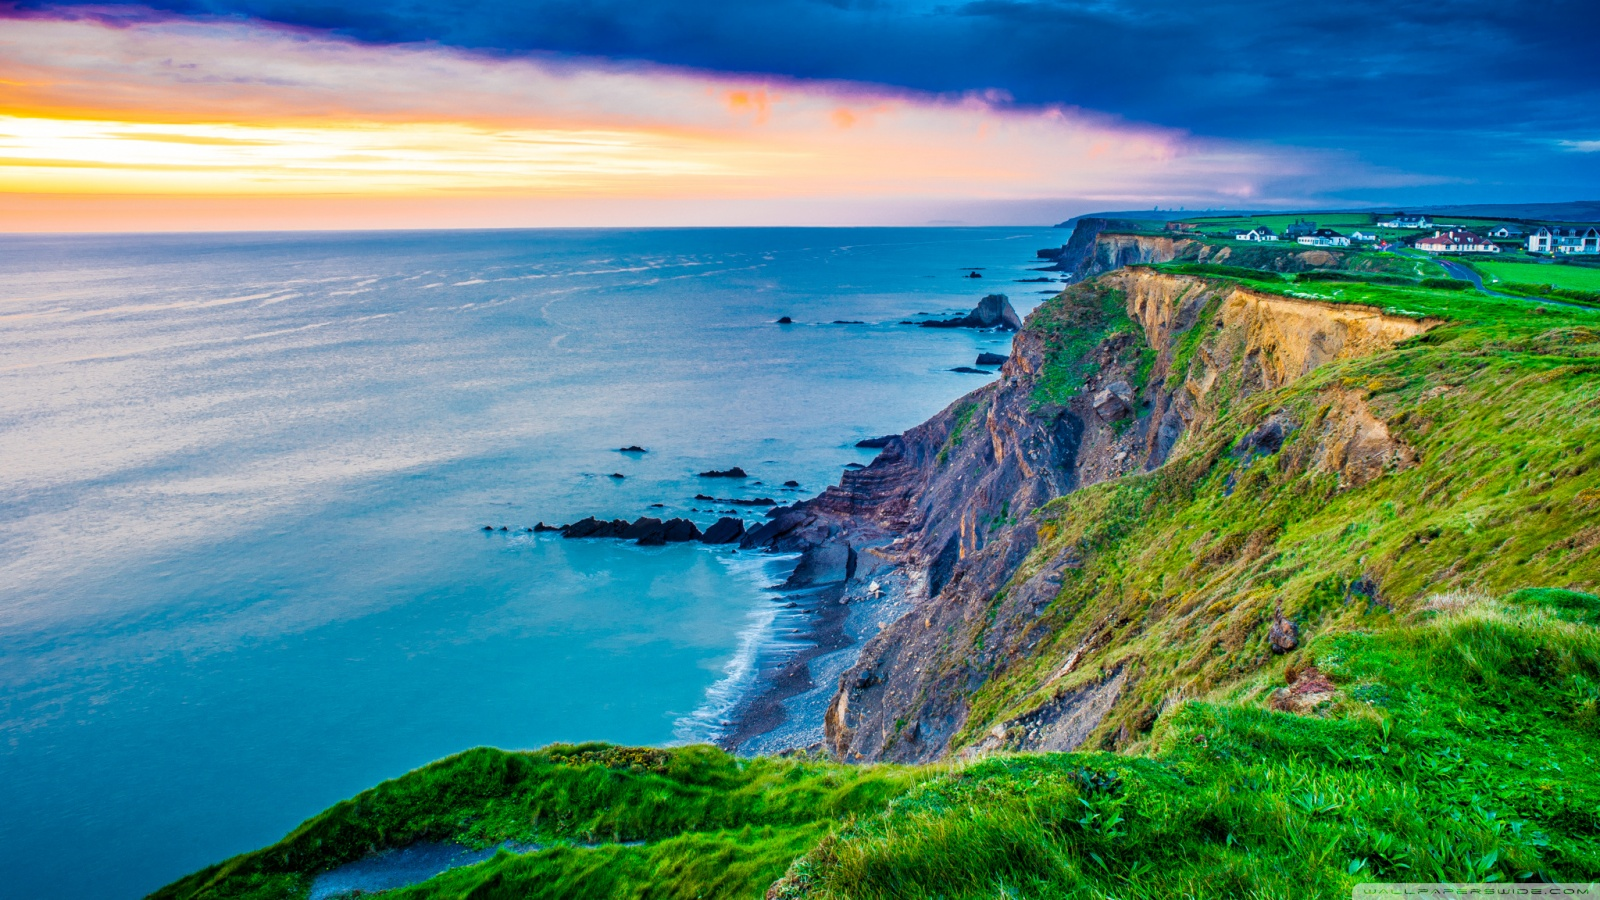 Coast Cornwall England United Kingdom 4K HD Desktop 1600x900